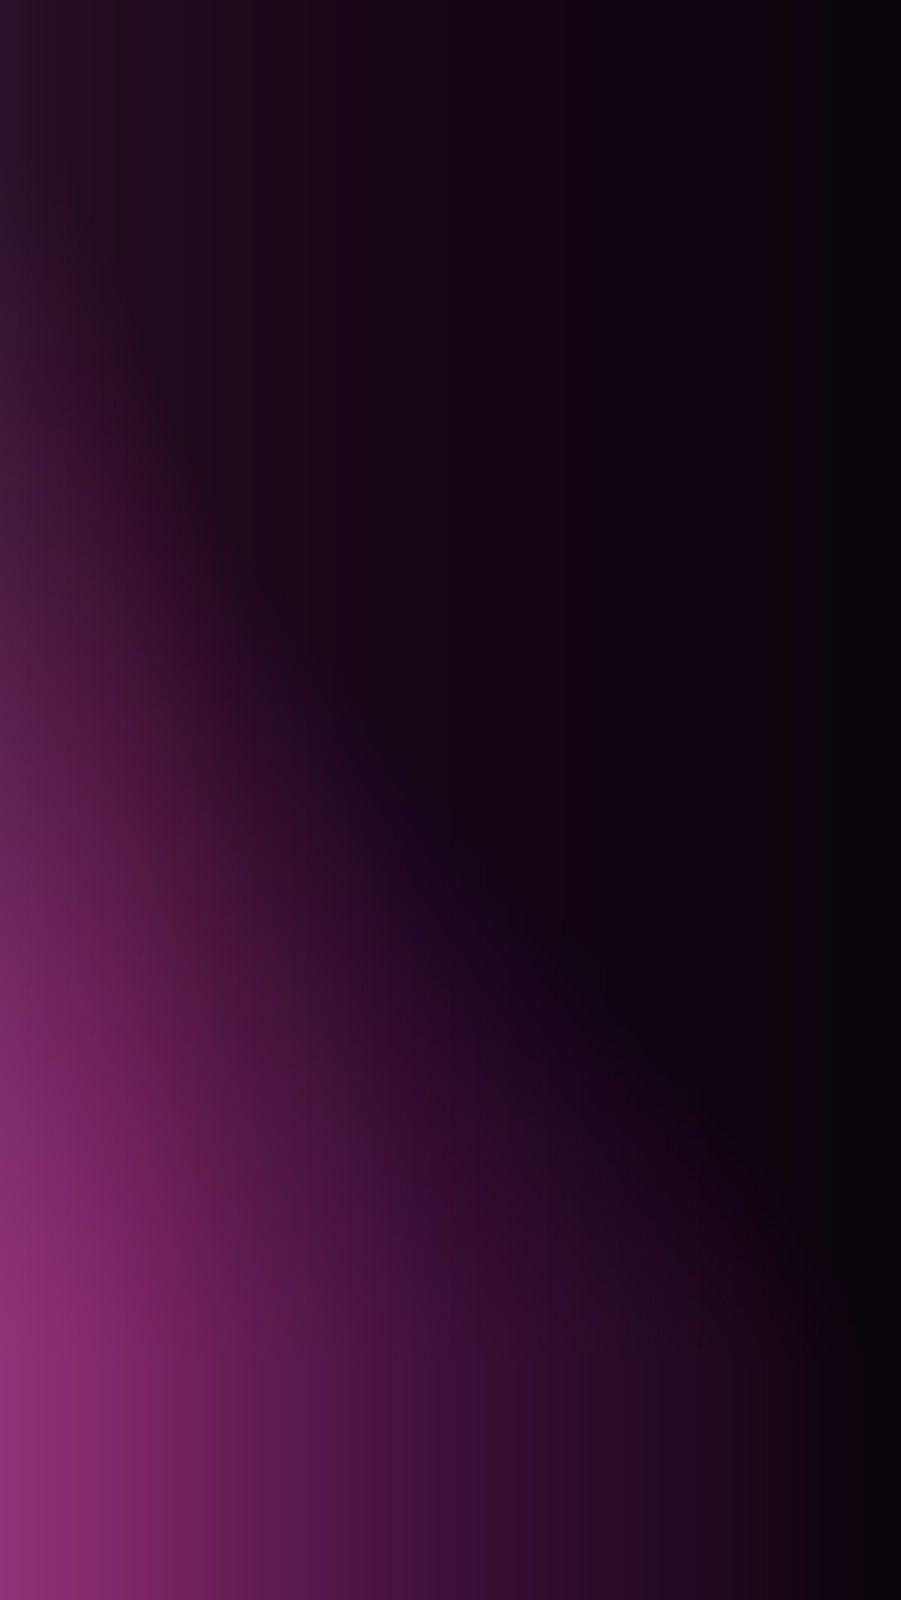 Pingl par eyy up sur minimal pinterest cran fond for Fond ecran uni